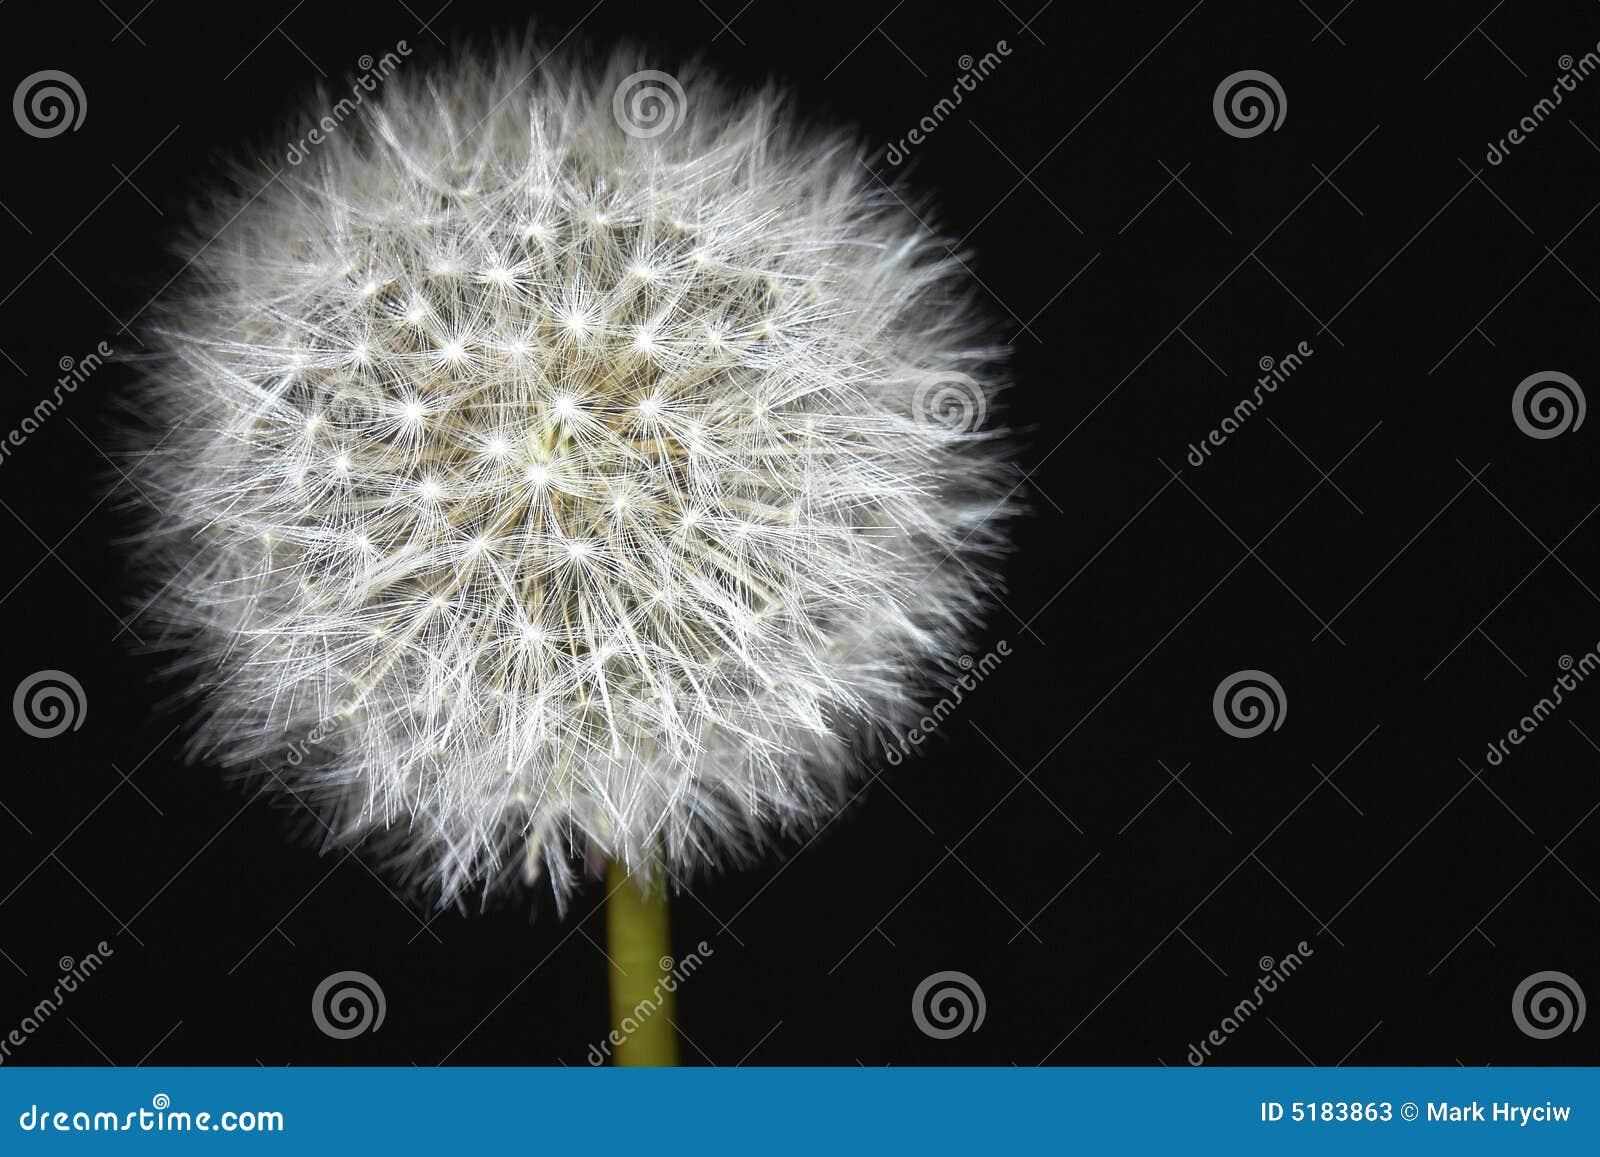 Dandelion Isolated Black Seed